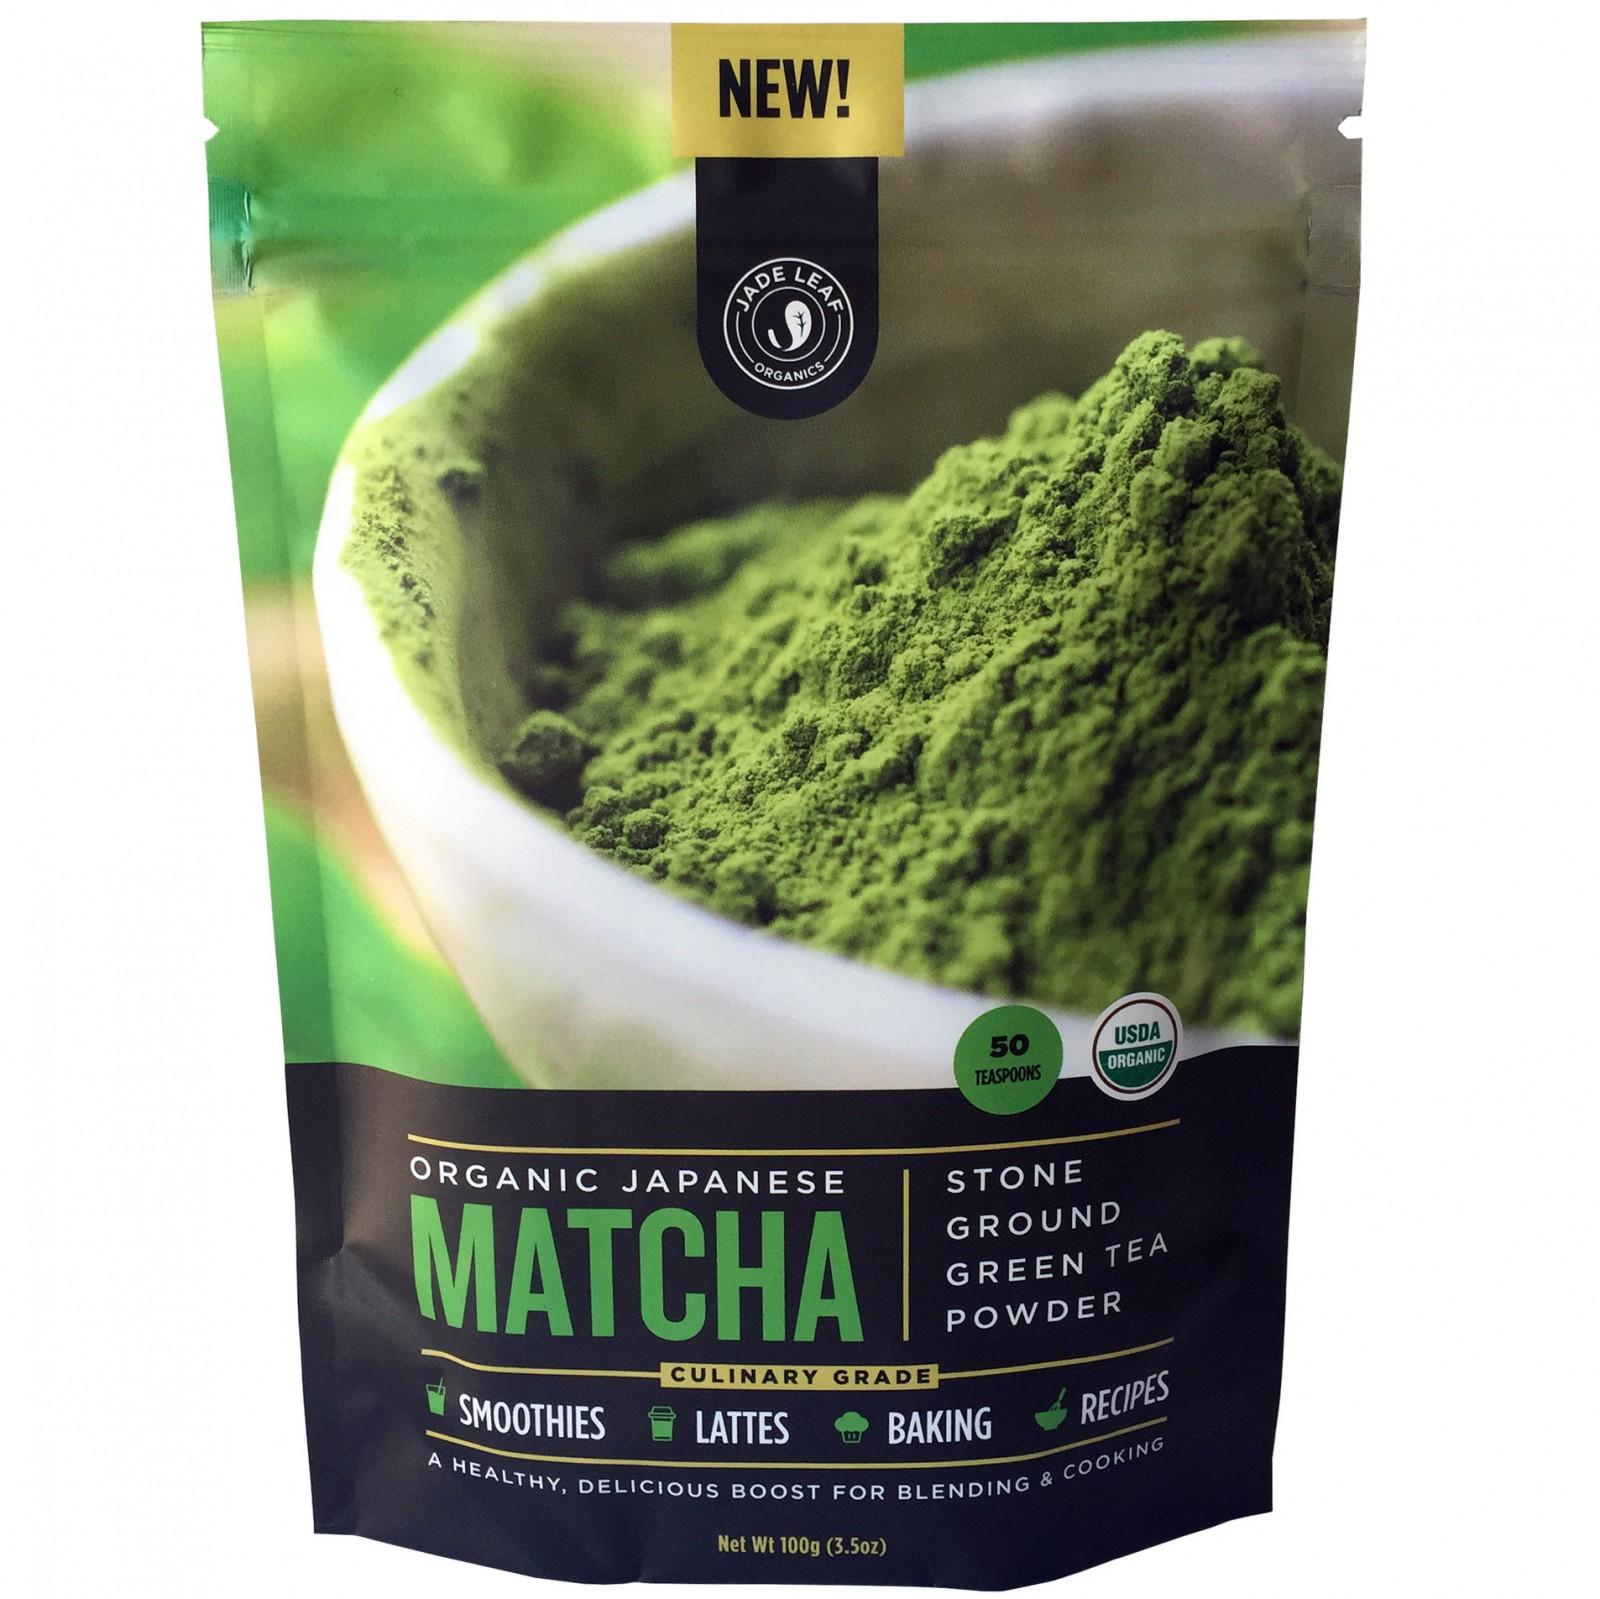 the matcha canada